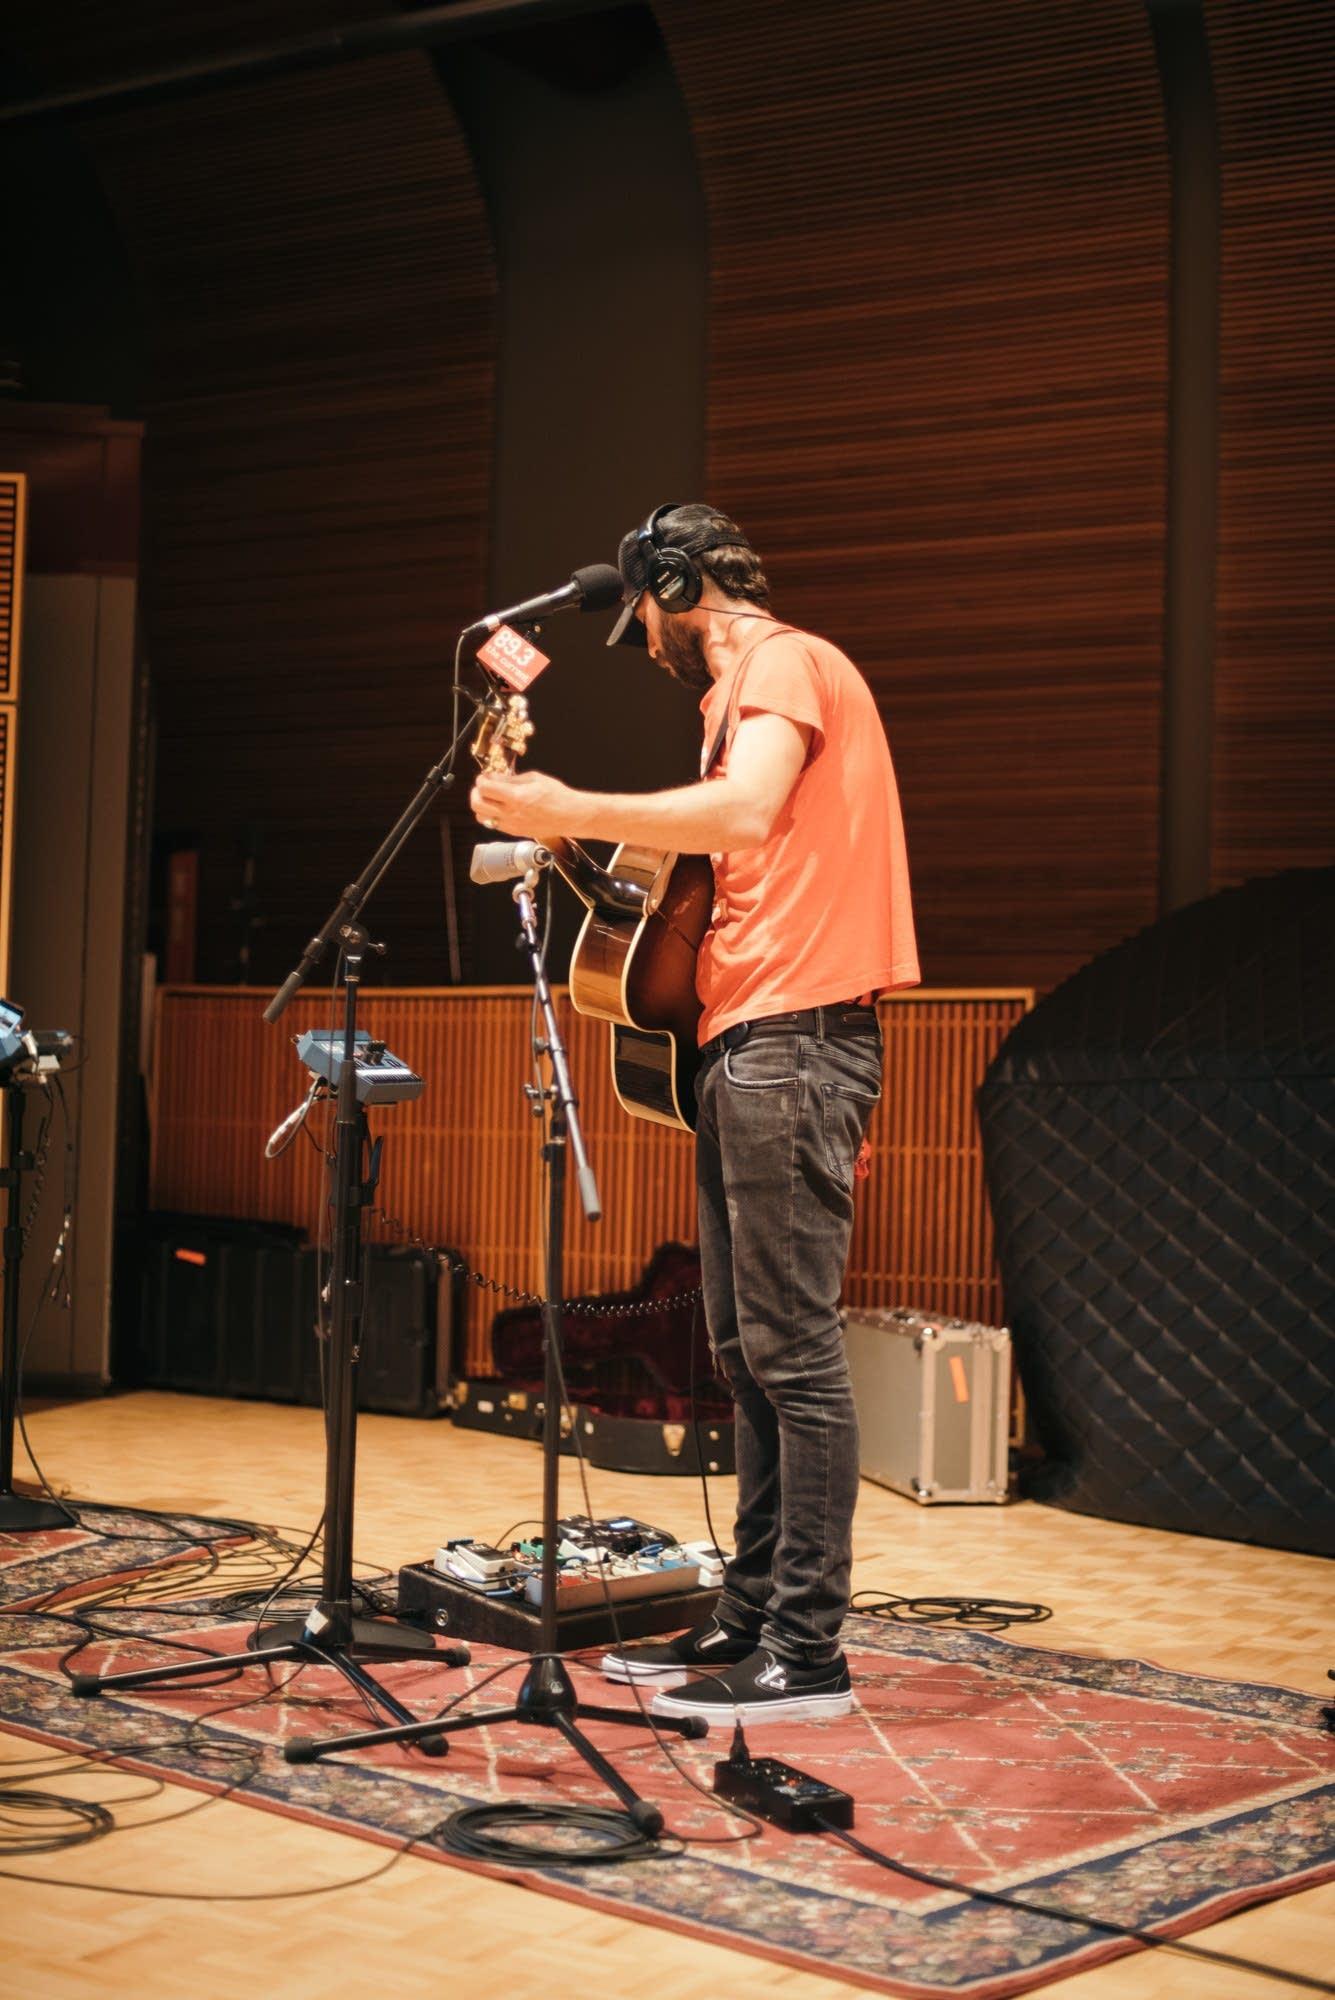 Mondo Cozmo performs in The Current studio